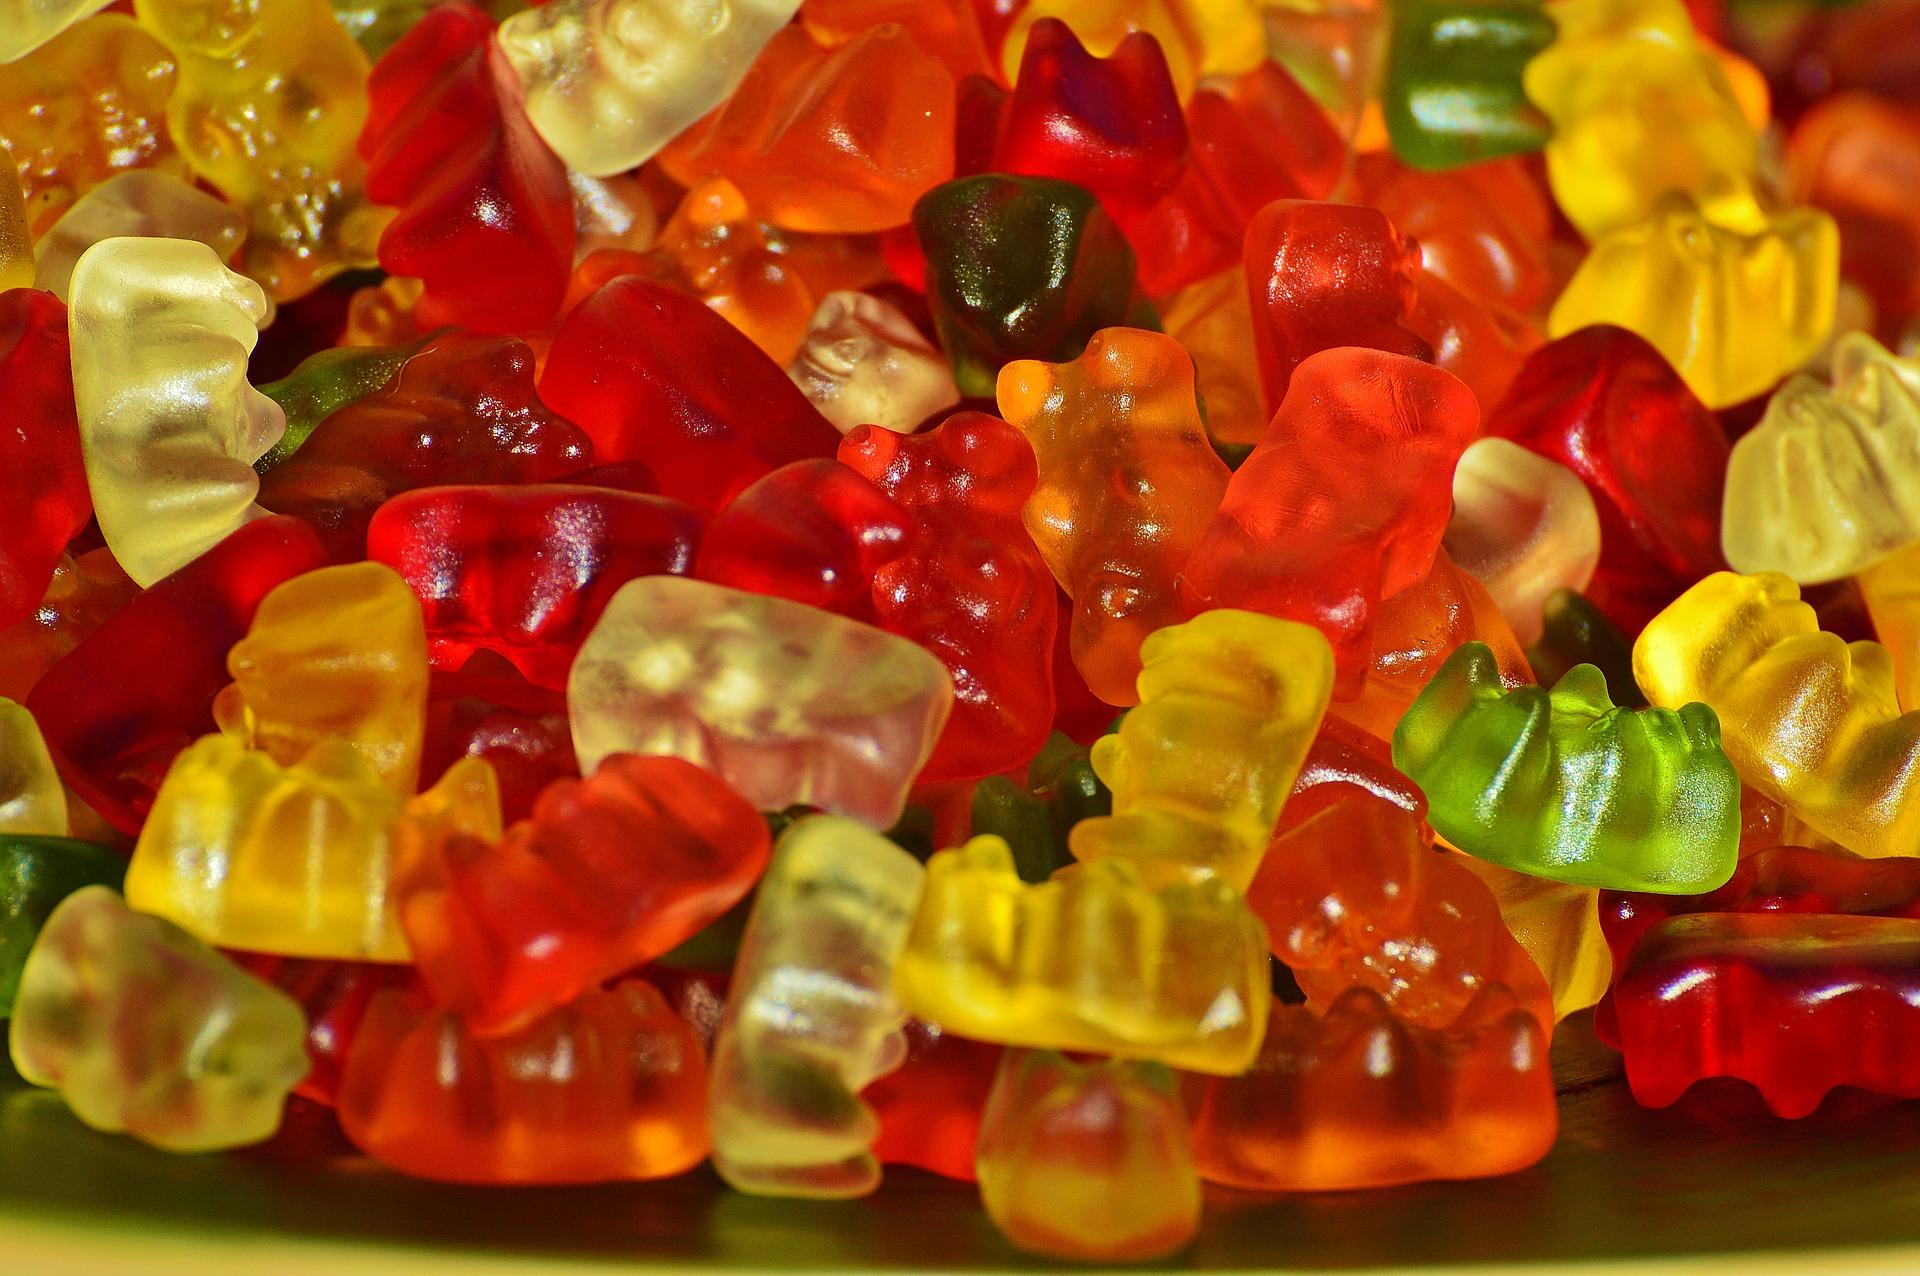 Gummy bears (alluding to the branding power of shape)